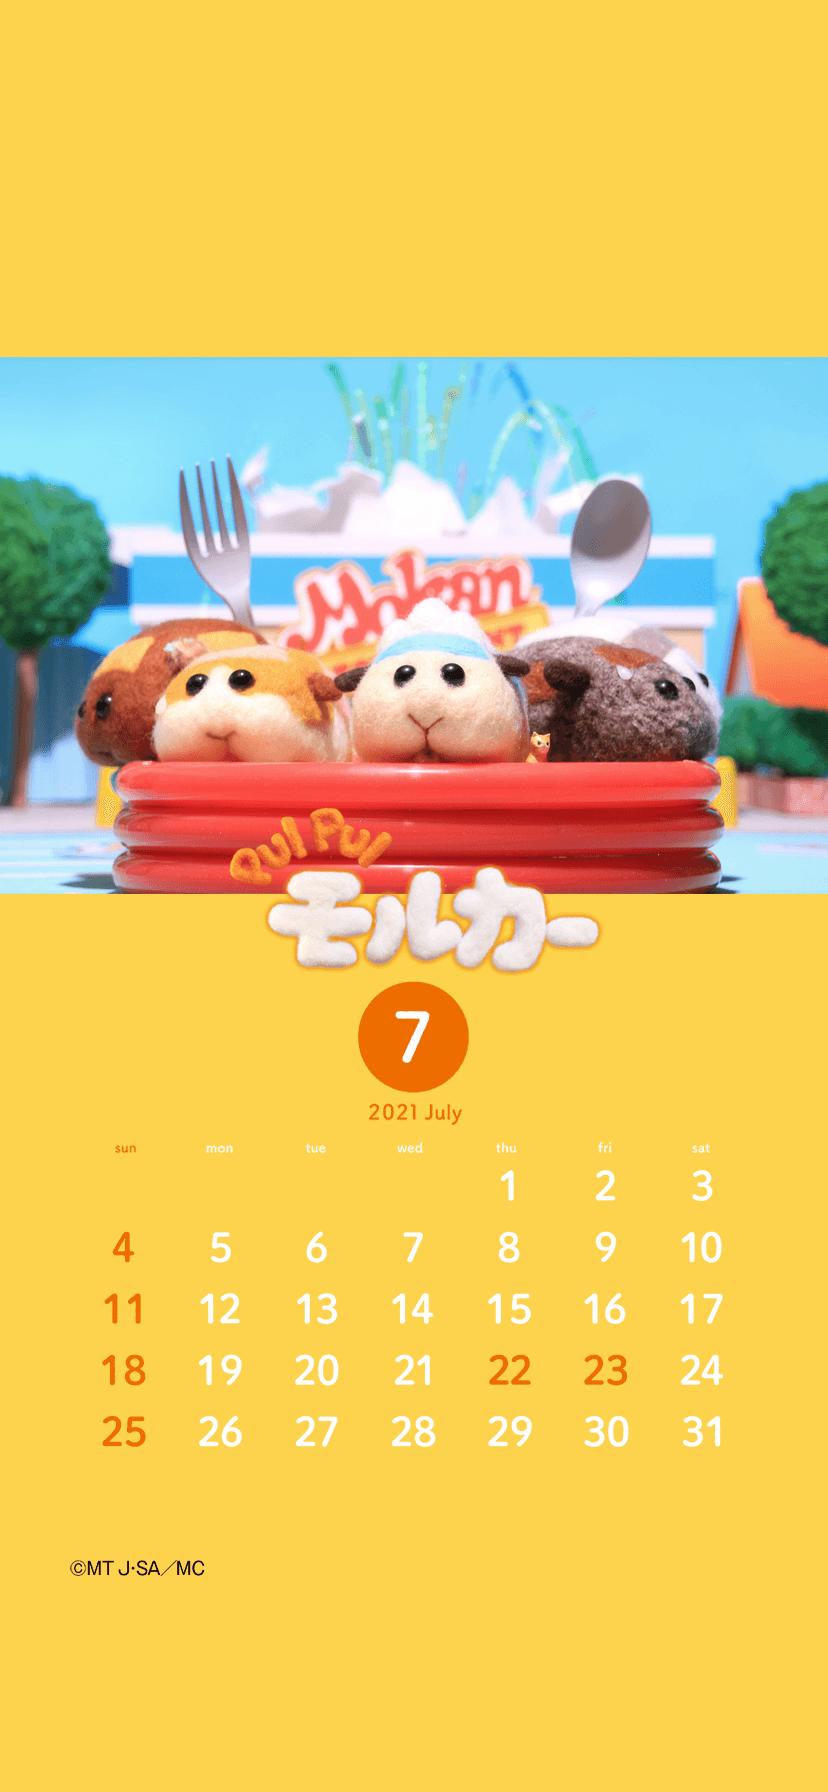 calendar July for smartphone